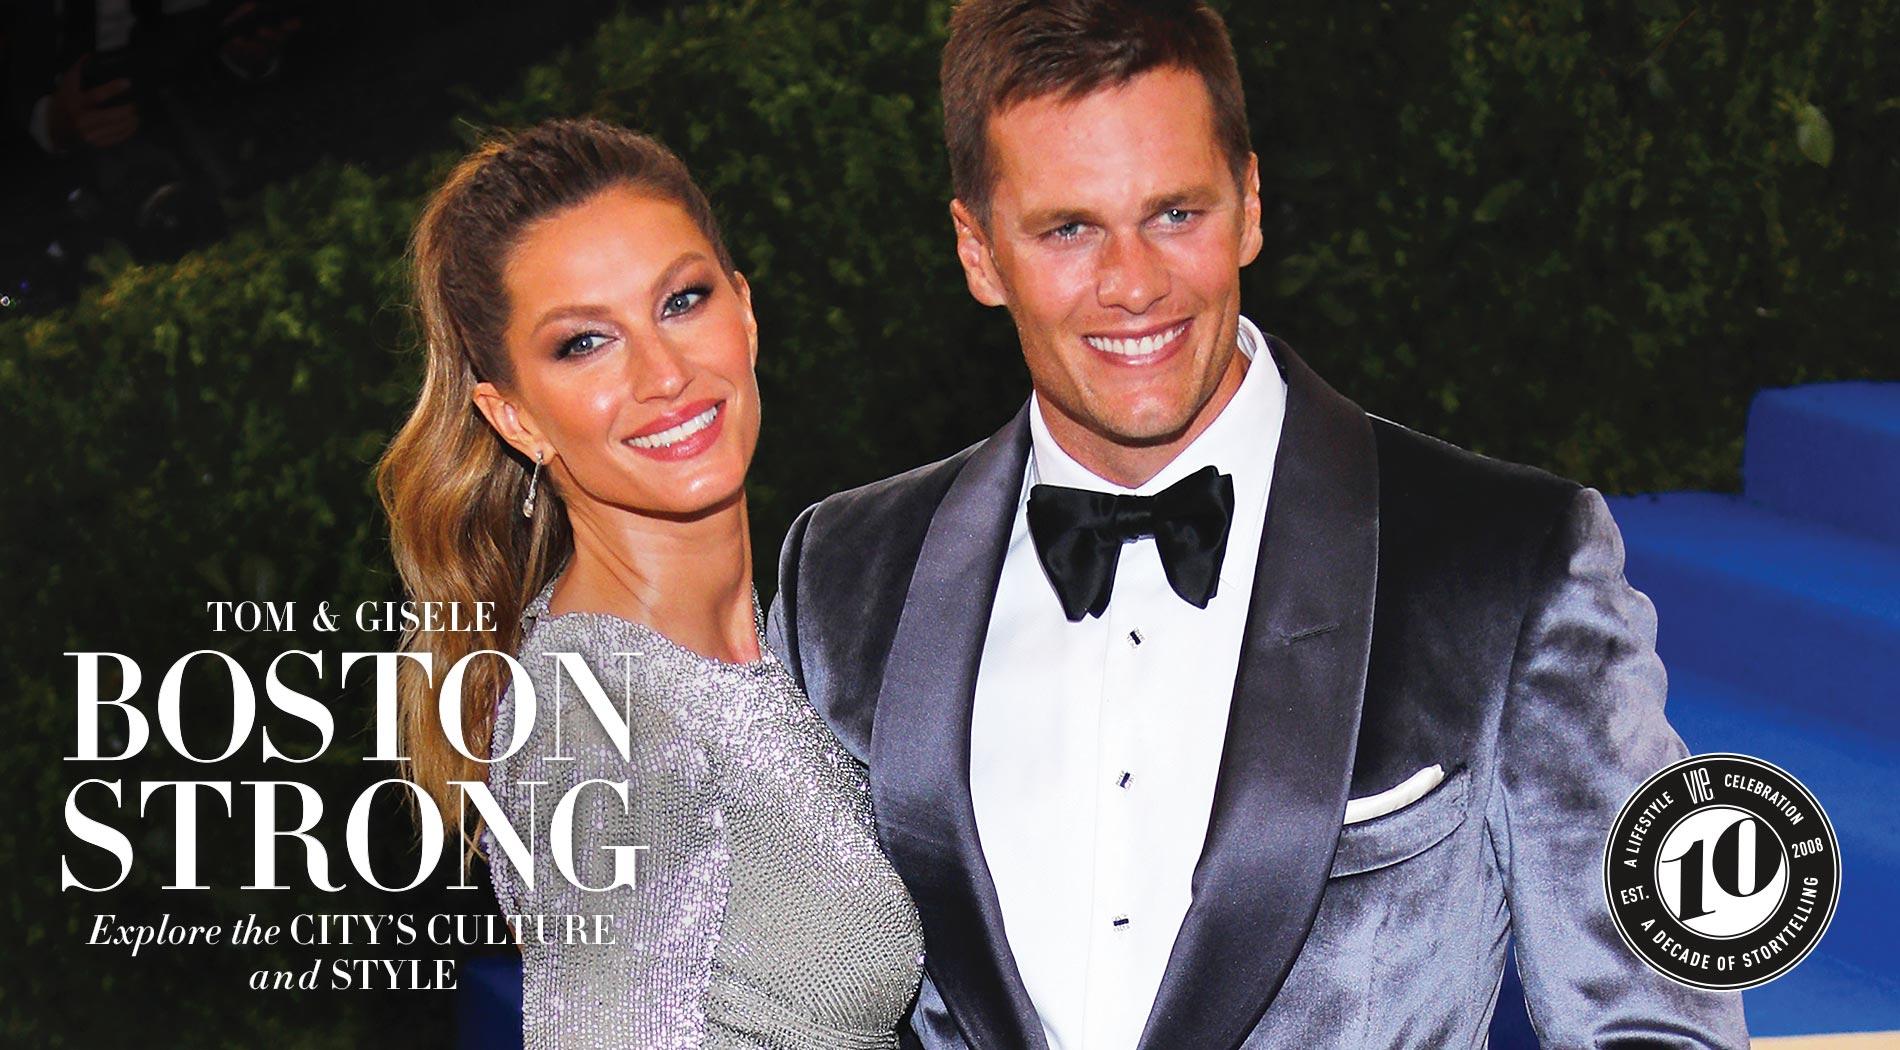 VIE Magazine, The Sophisticate Issue, December 2017, Tom Brady & Gisele